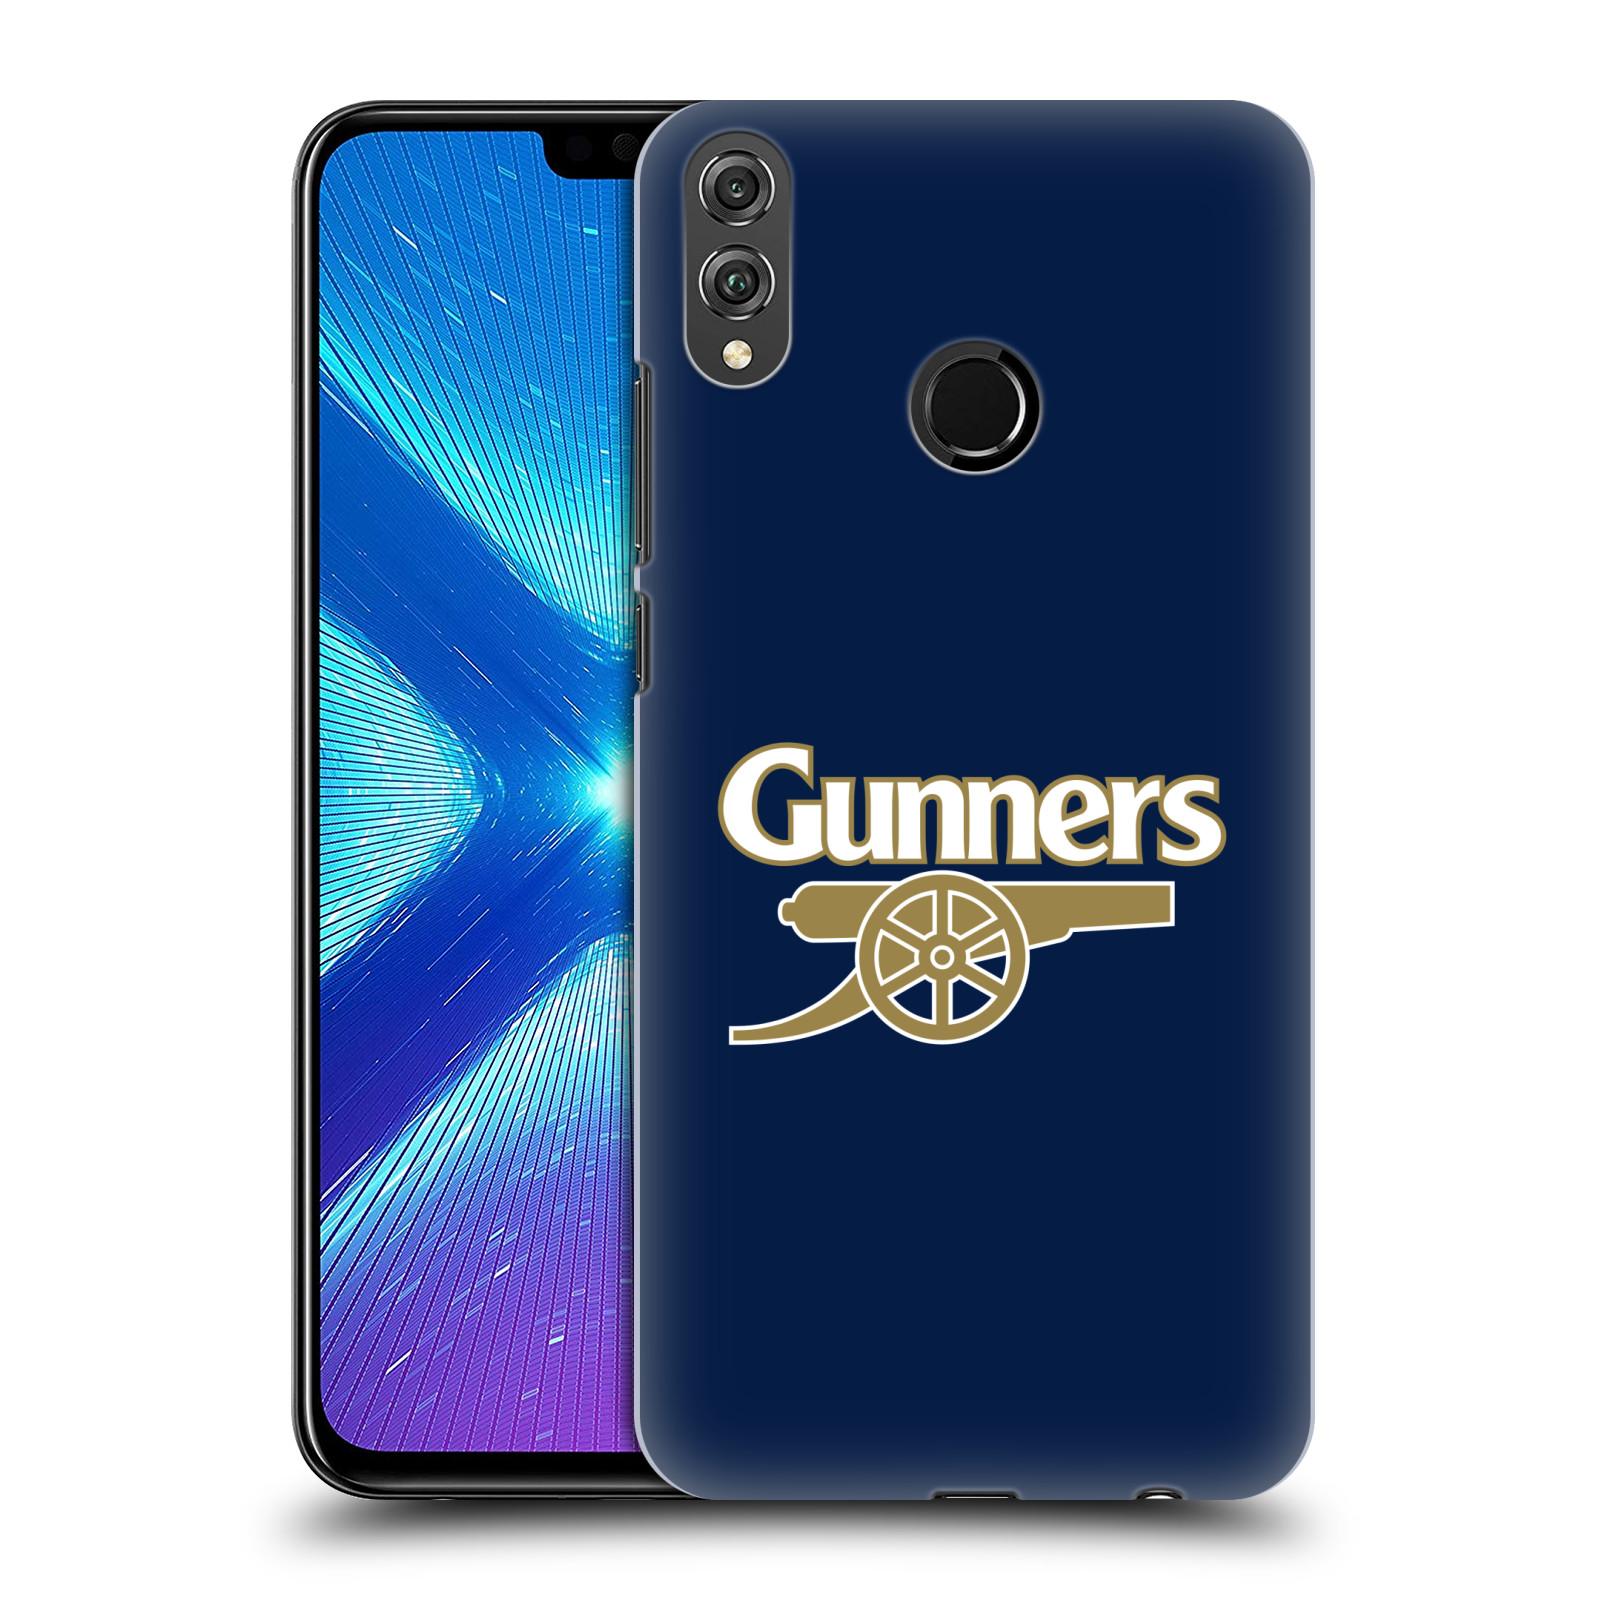 Plastové pouzdro na mobil Honor 8X - Head Case - Arsenal FC - Gunners